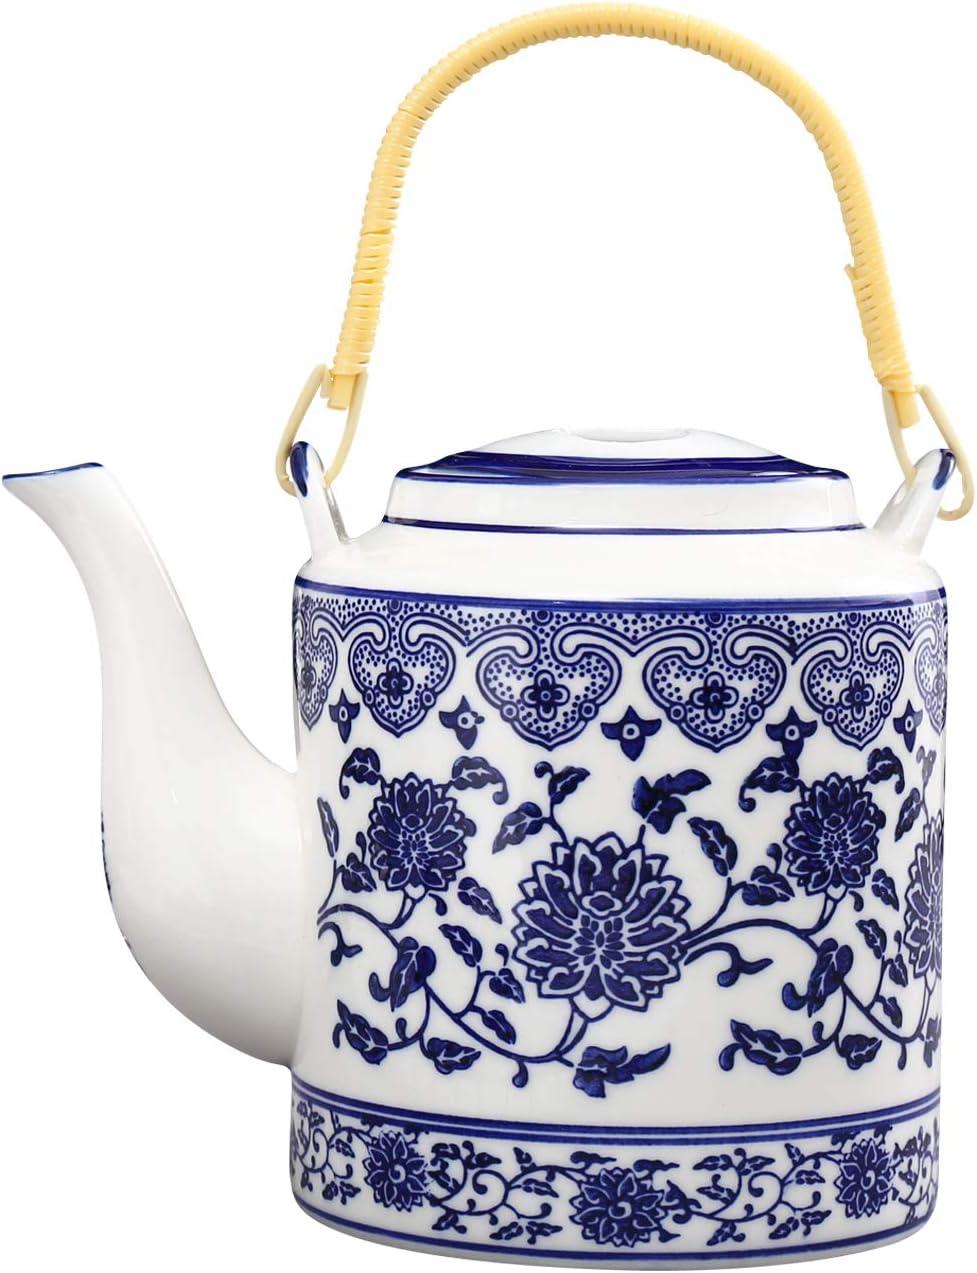 ufengke 30oz Blue and White Porcelain Tea Pot,Large Ceramic Tea Pot for Kungfu Tea,Blue Flowers Ceramic Lifting Beam Pot